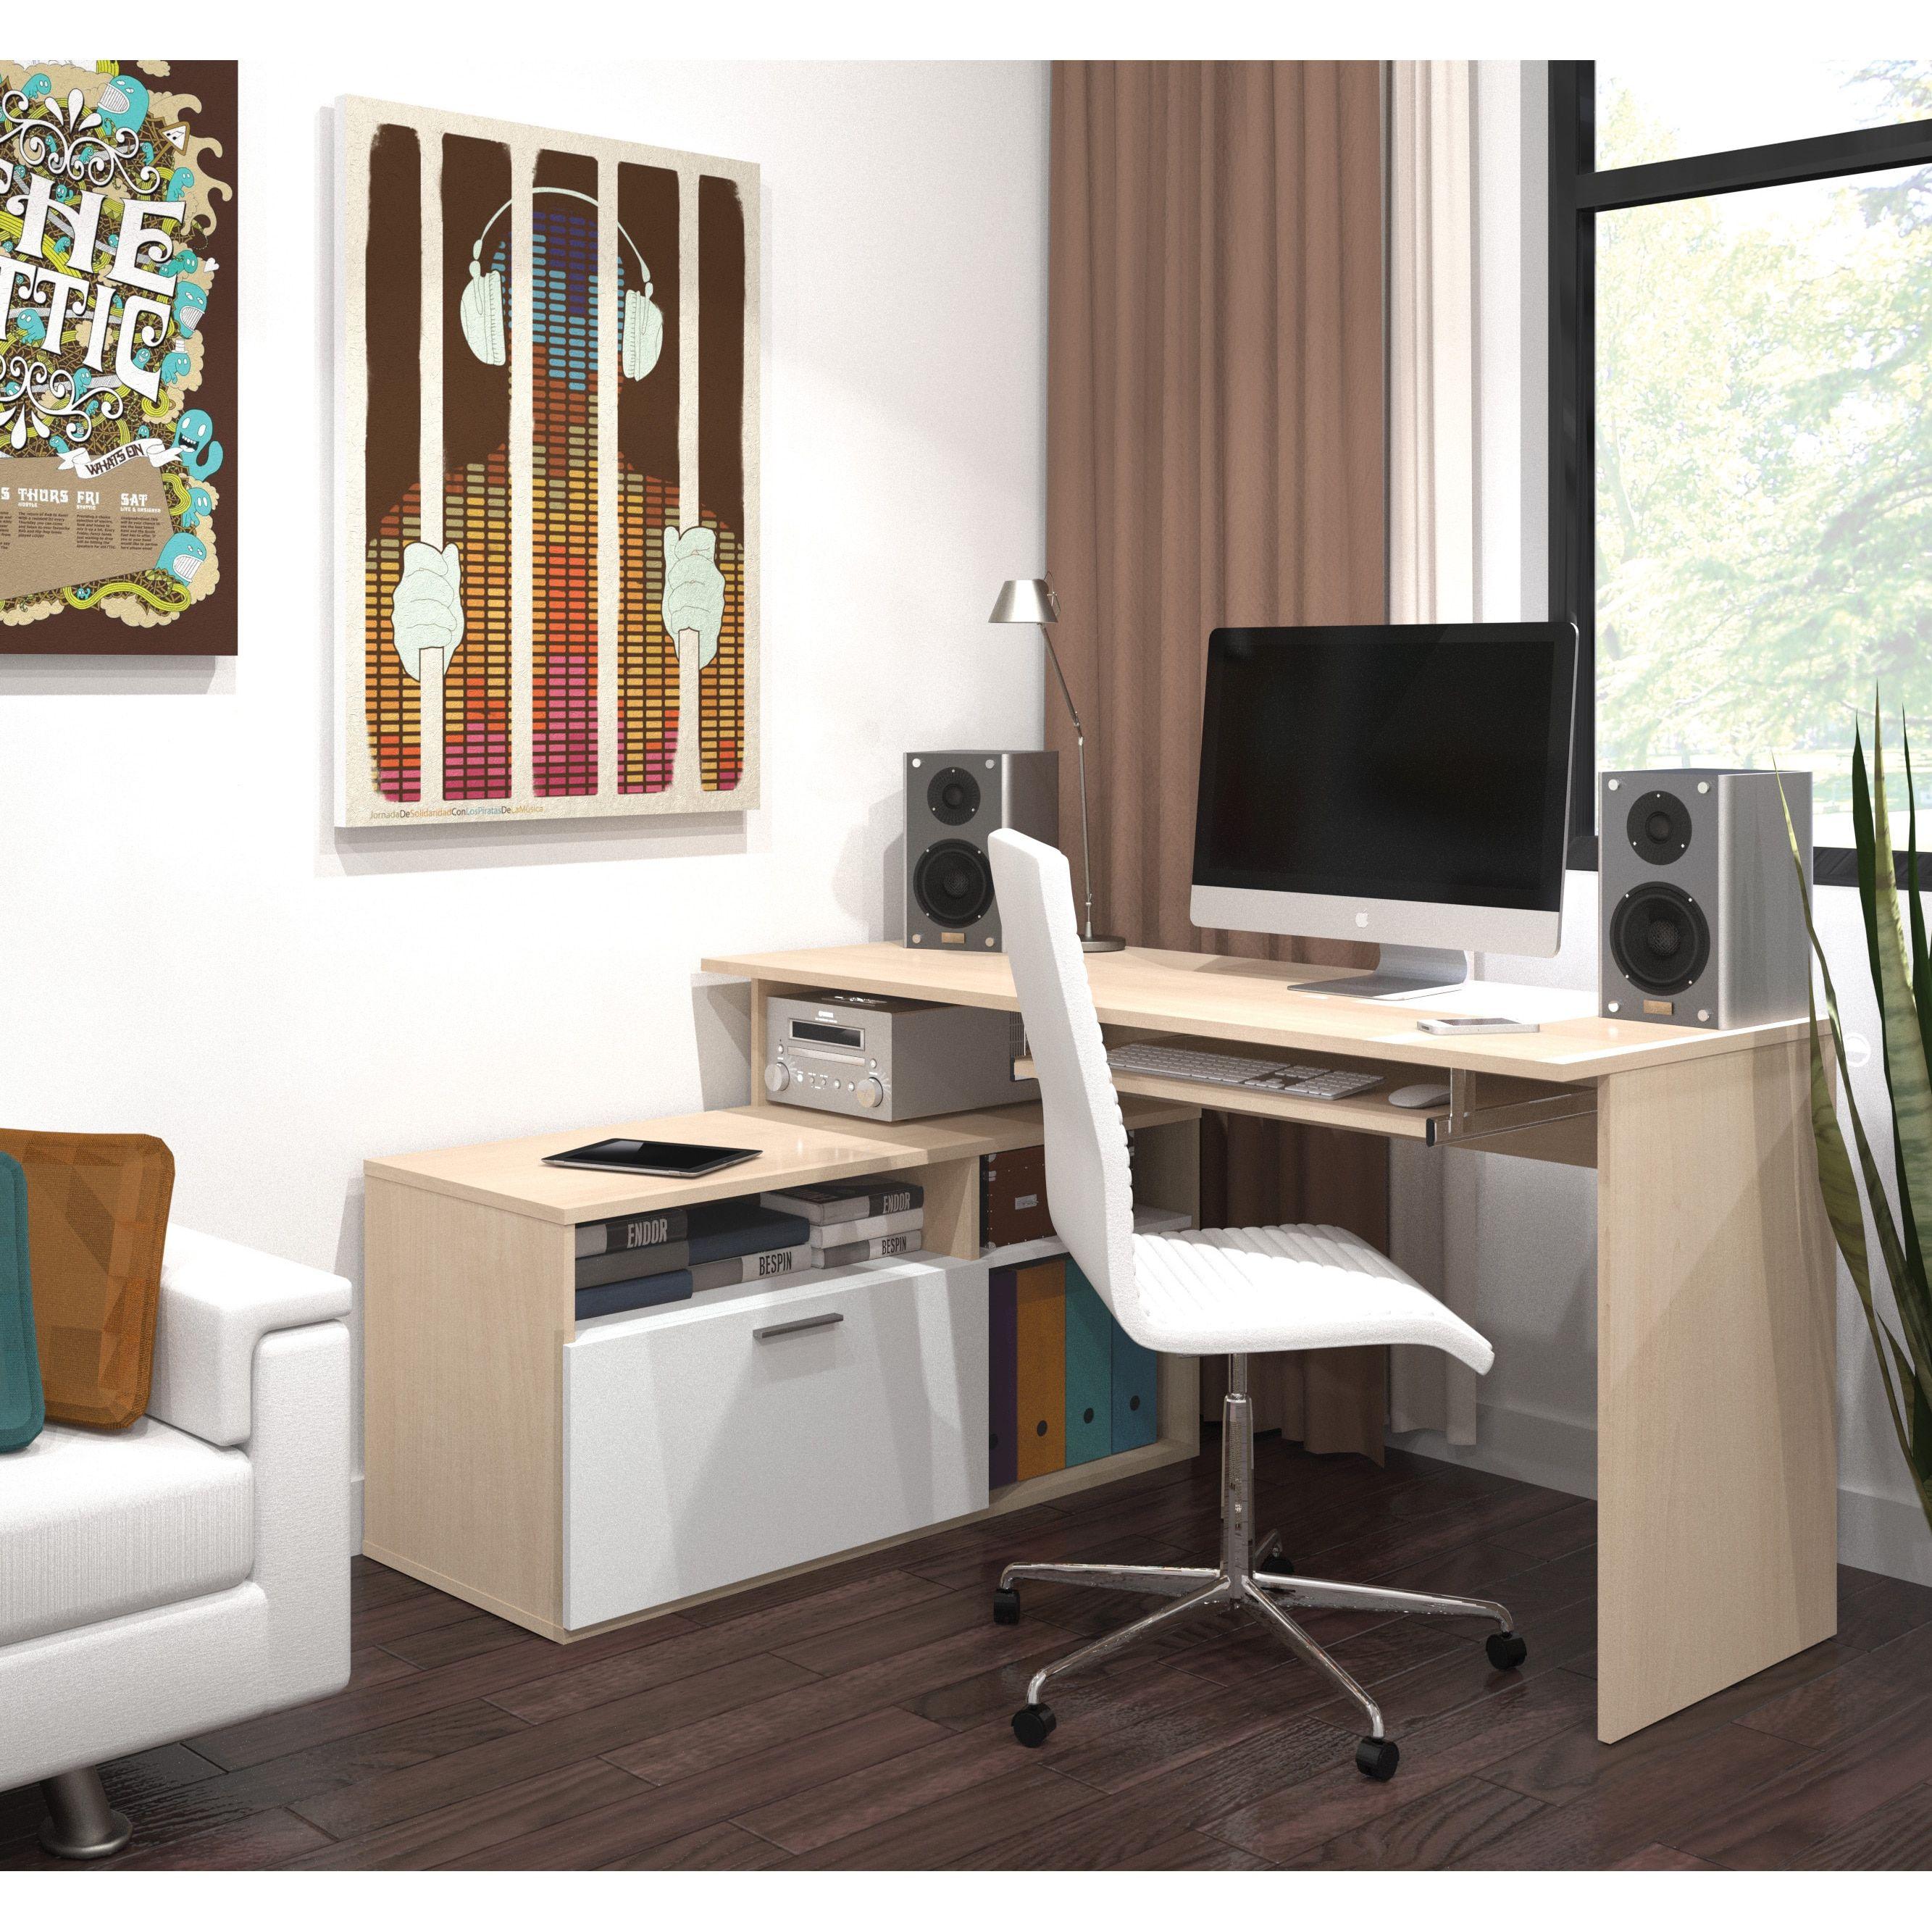 maple wood finish adjustable bestar modula compact l workstation desk wood finish maple finish tuxedo brown office space